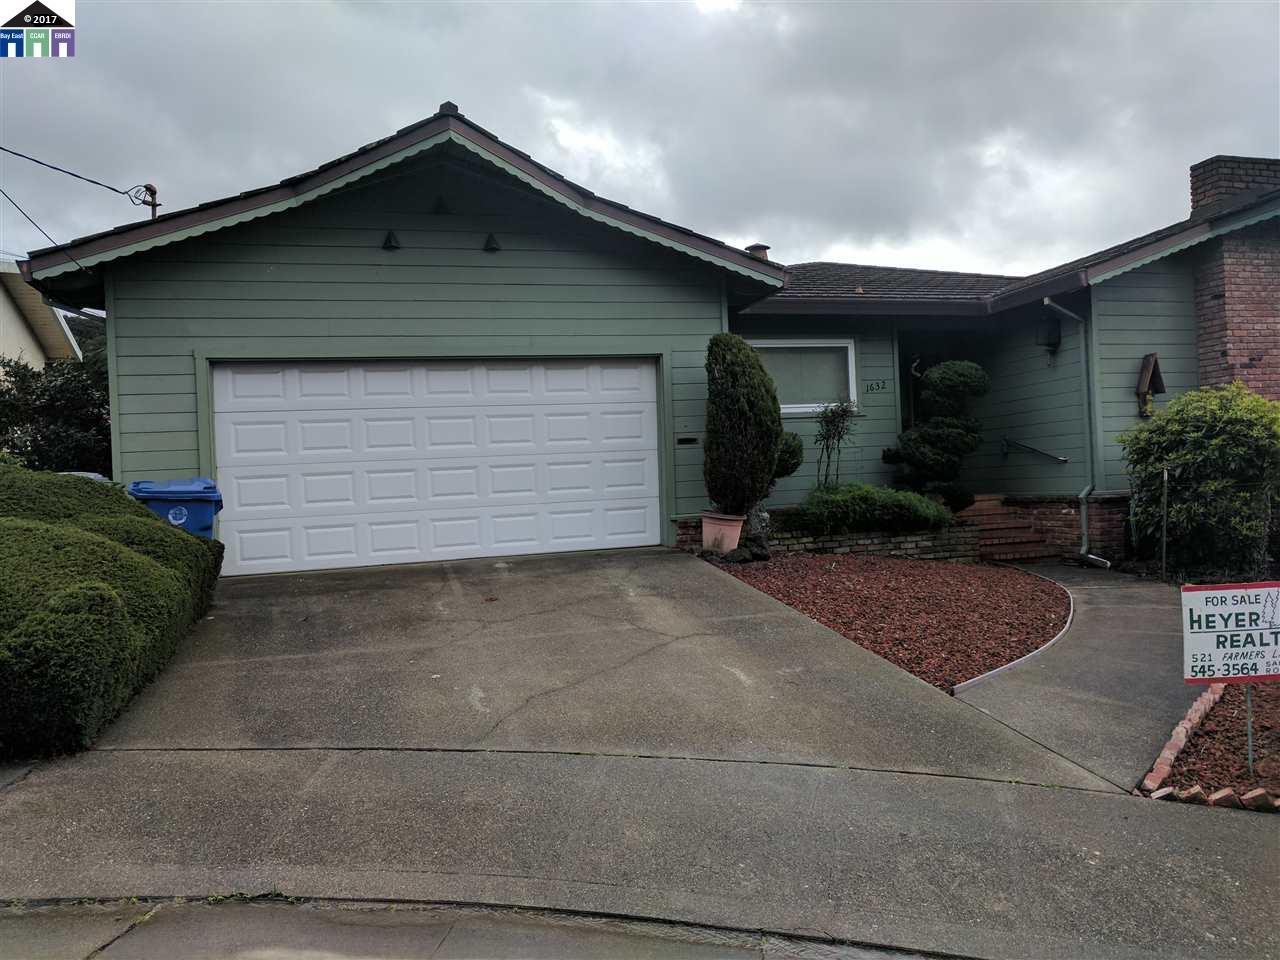 Single Family Home for Sale at 1632 Roger Court El Cerrito, California 94530 United States